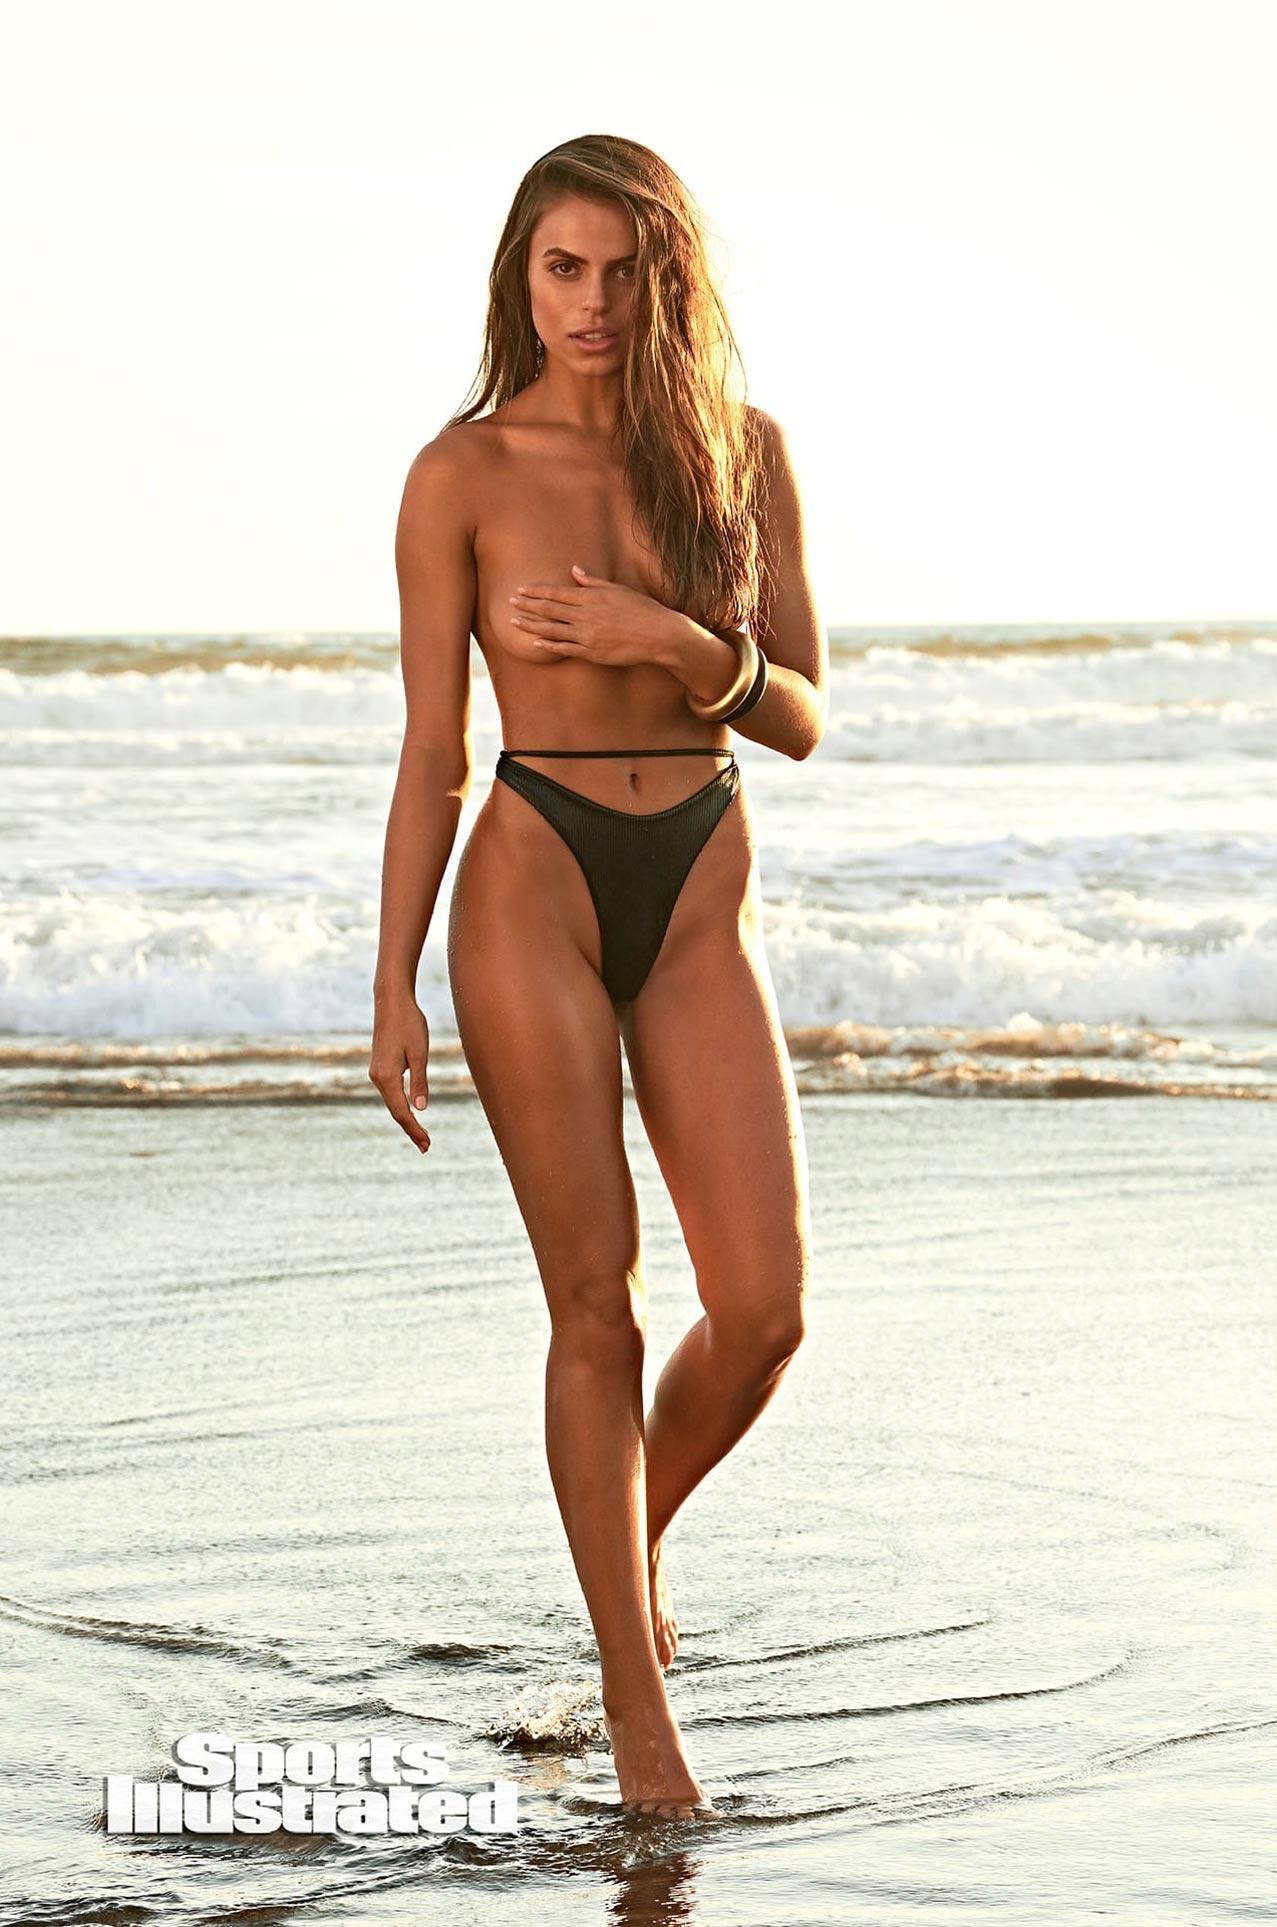 Брукс Надер в каталоге купальников Sports Illustrated Swimsuit 2020 / фото 19